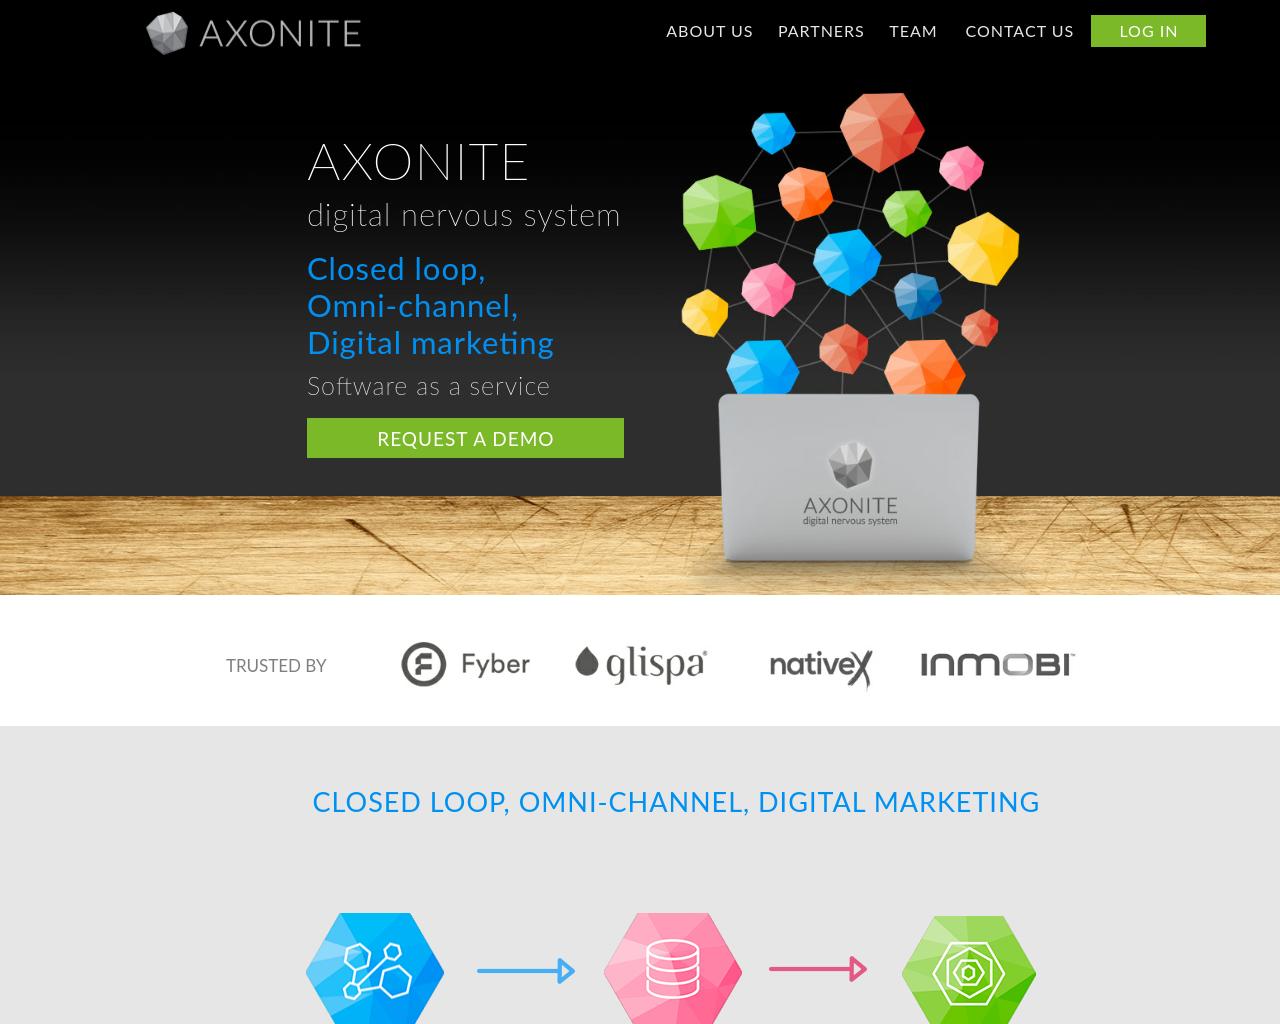 AXONITE-Advertising-Reviews-Pricing